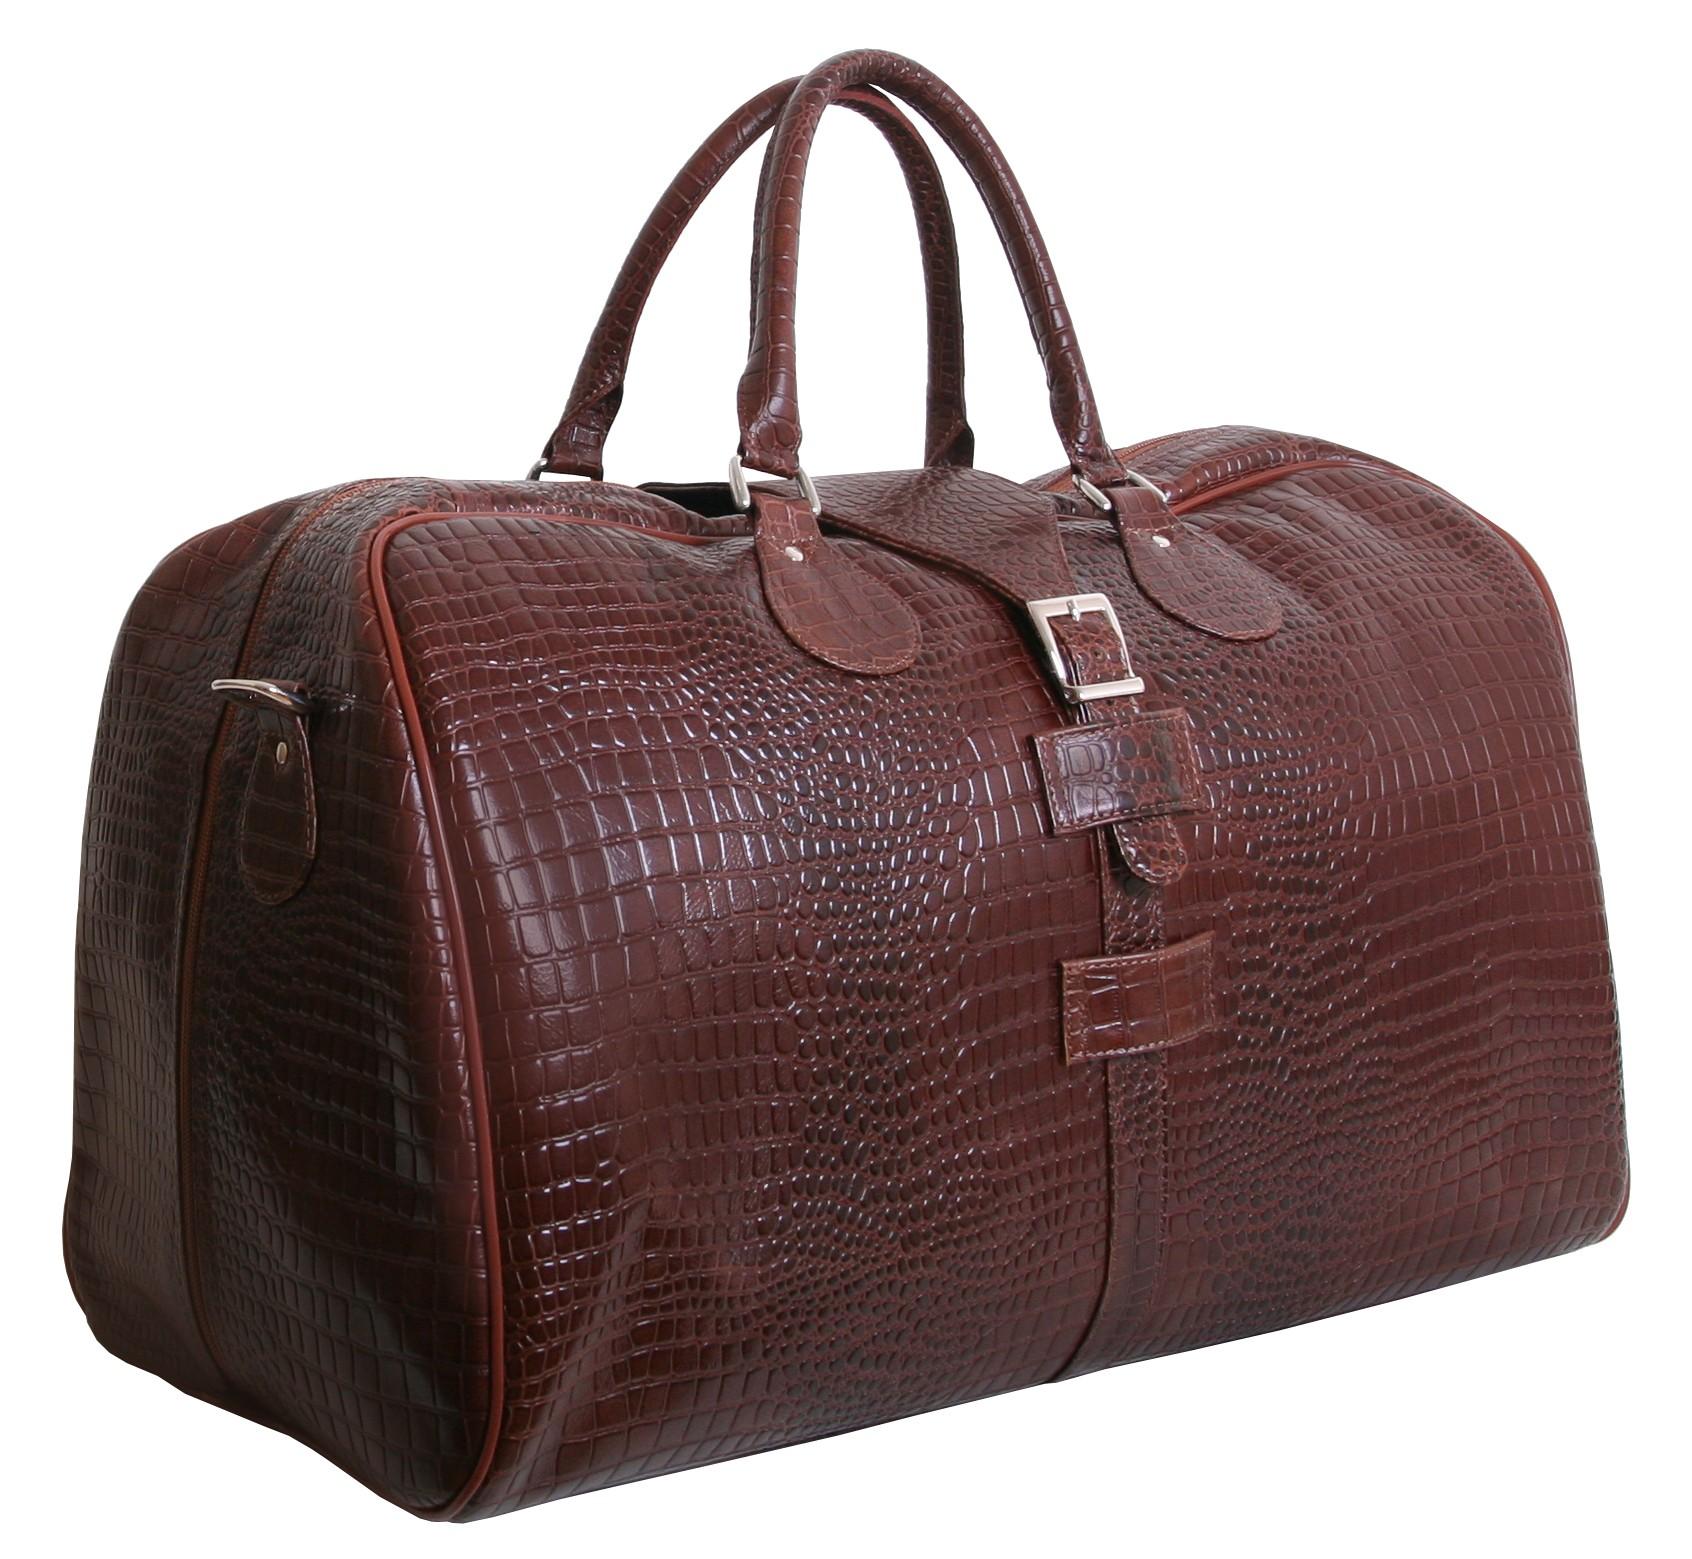 fcfd71de7308 Кожаная дорожная сумка люкс сегмента в стиле рептилии от бренда VIP  COLLECTION (0-2005)